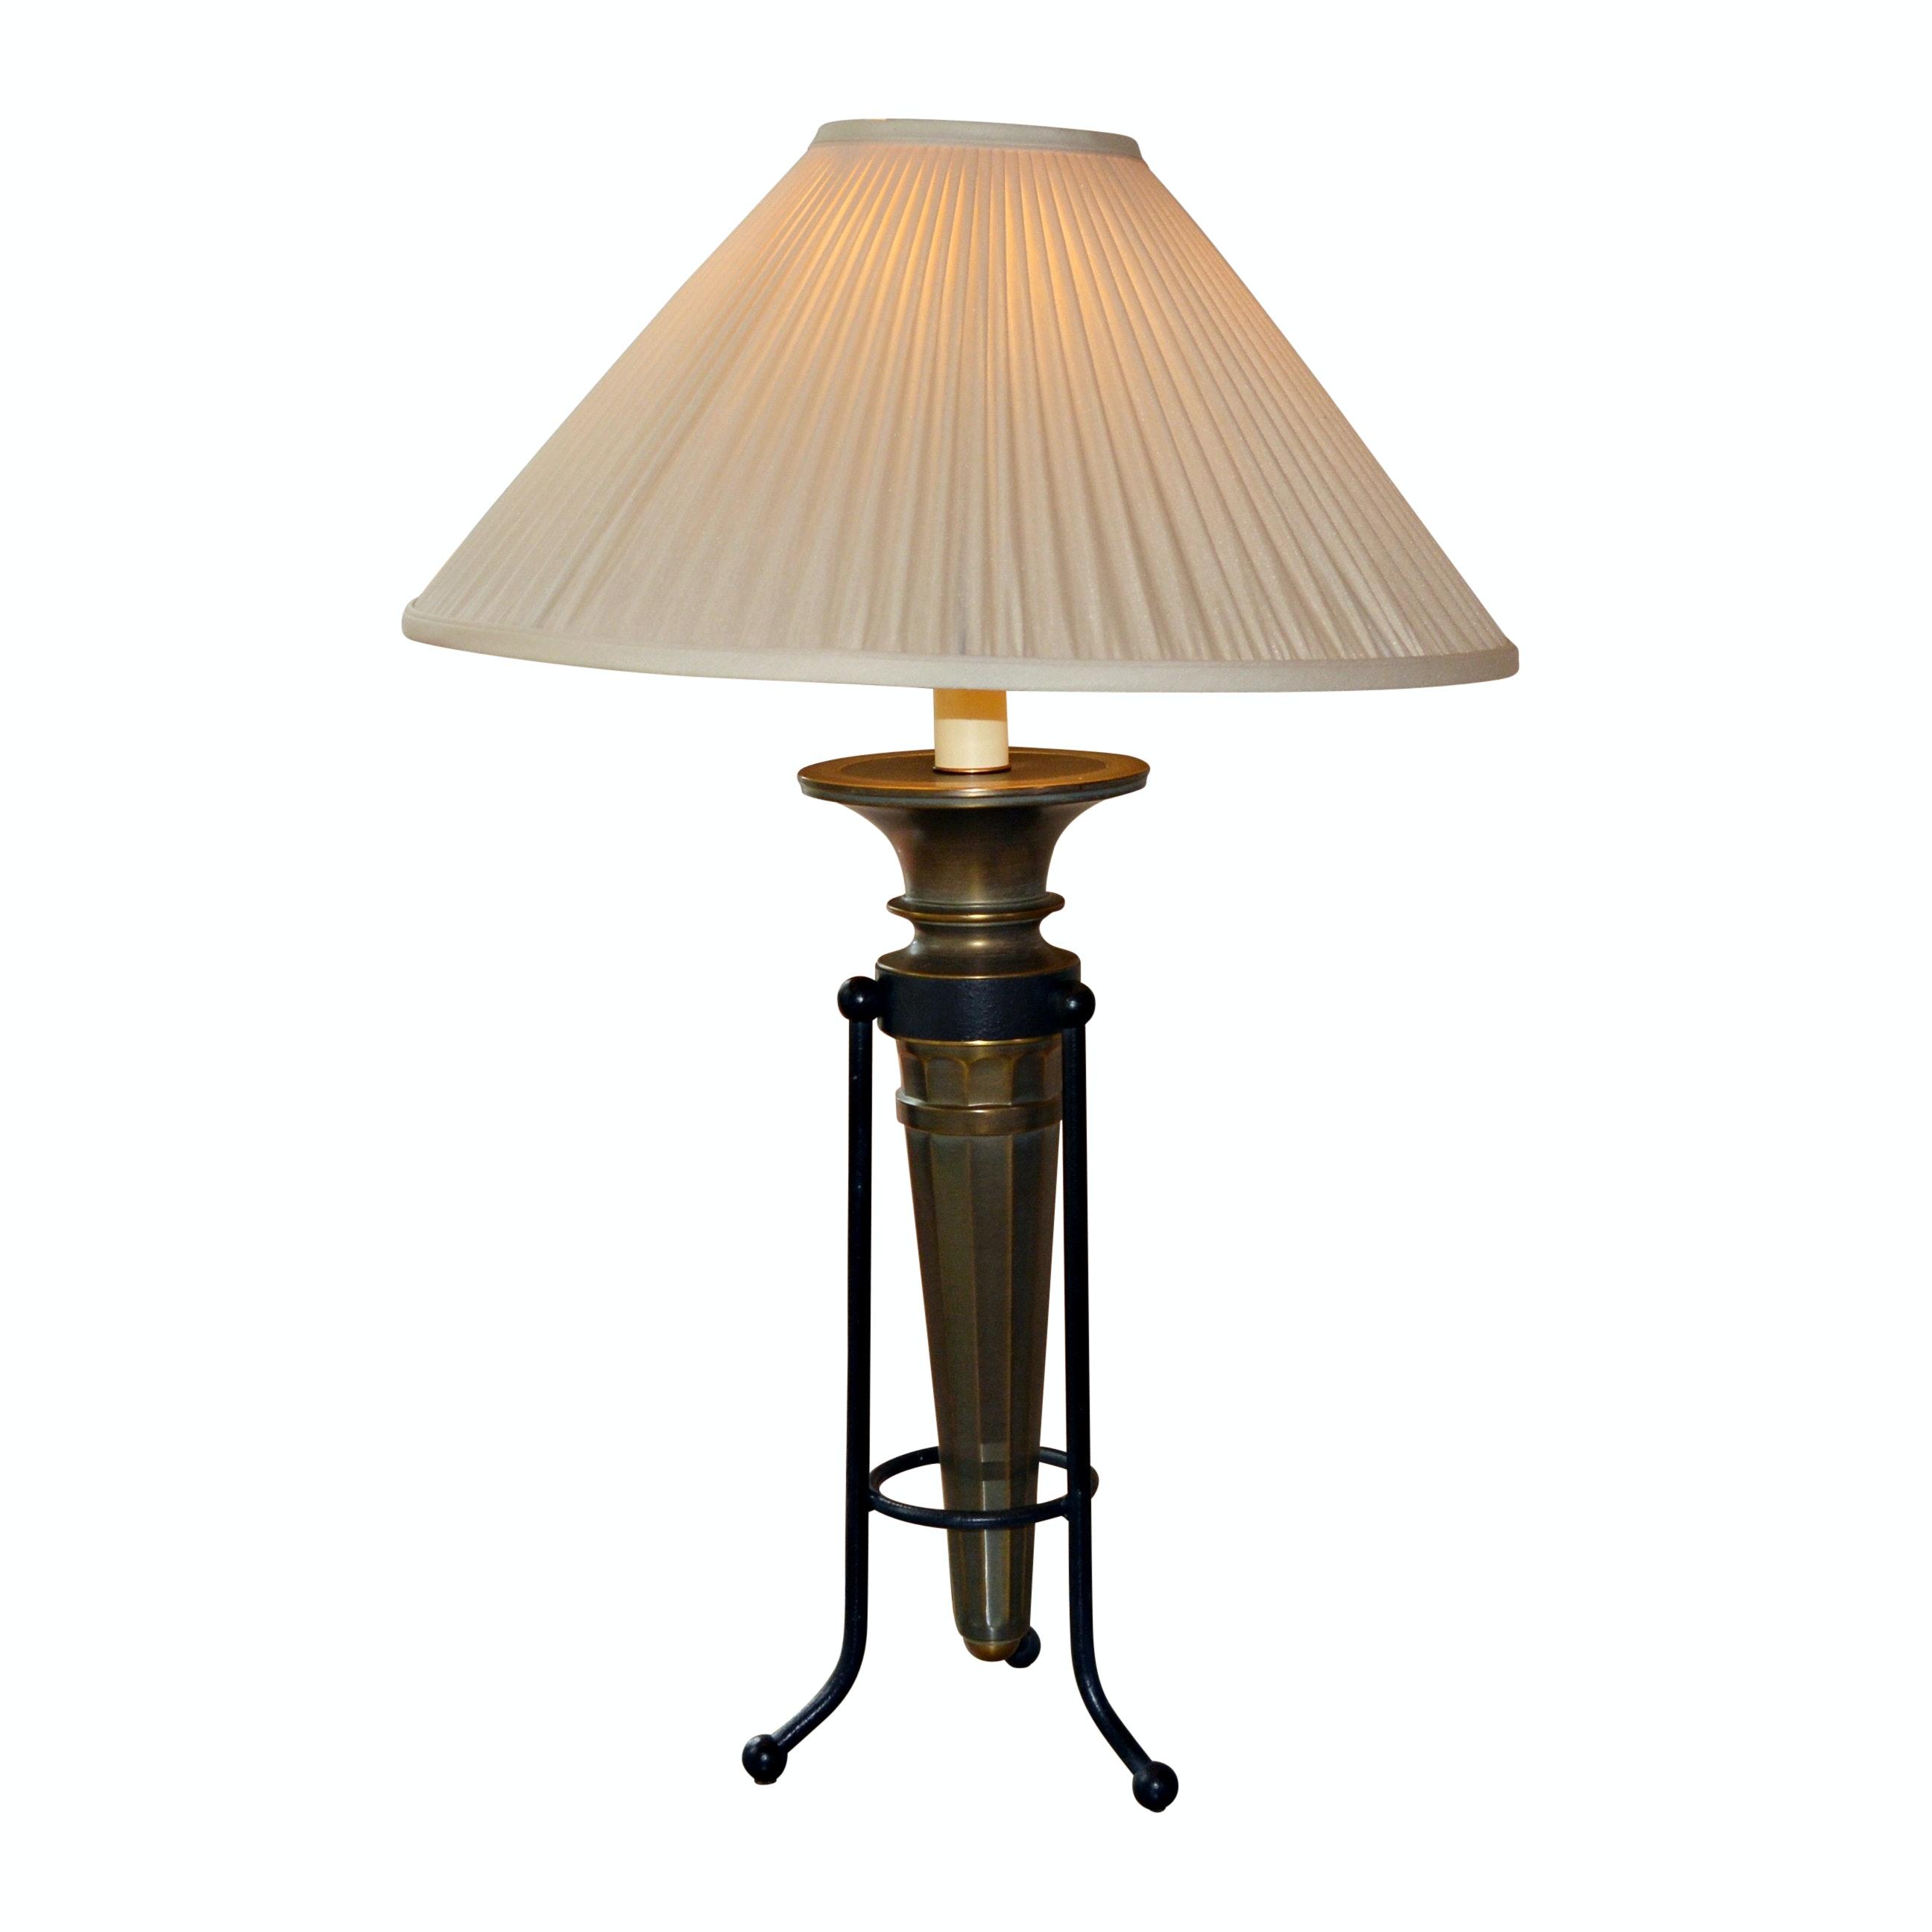 Ethan Allen Brass Table Lamp